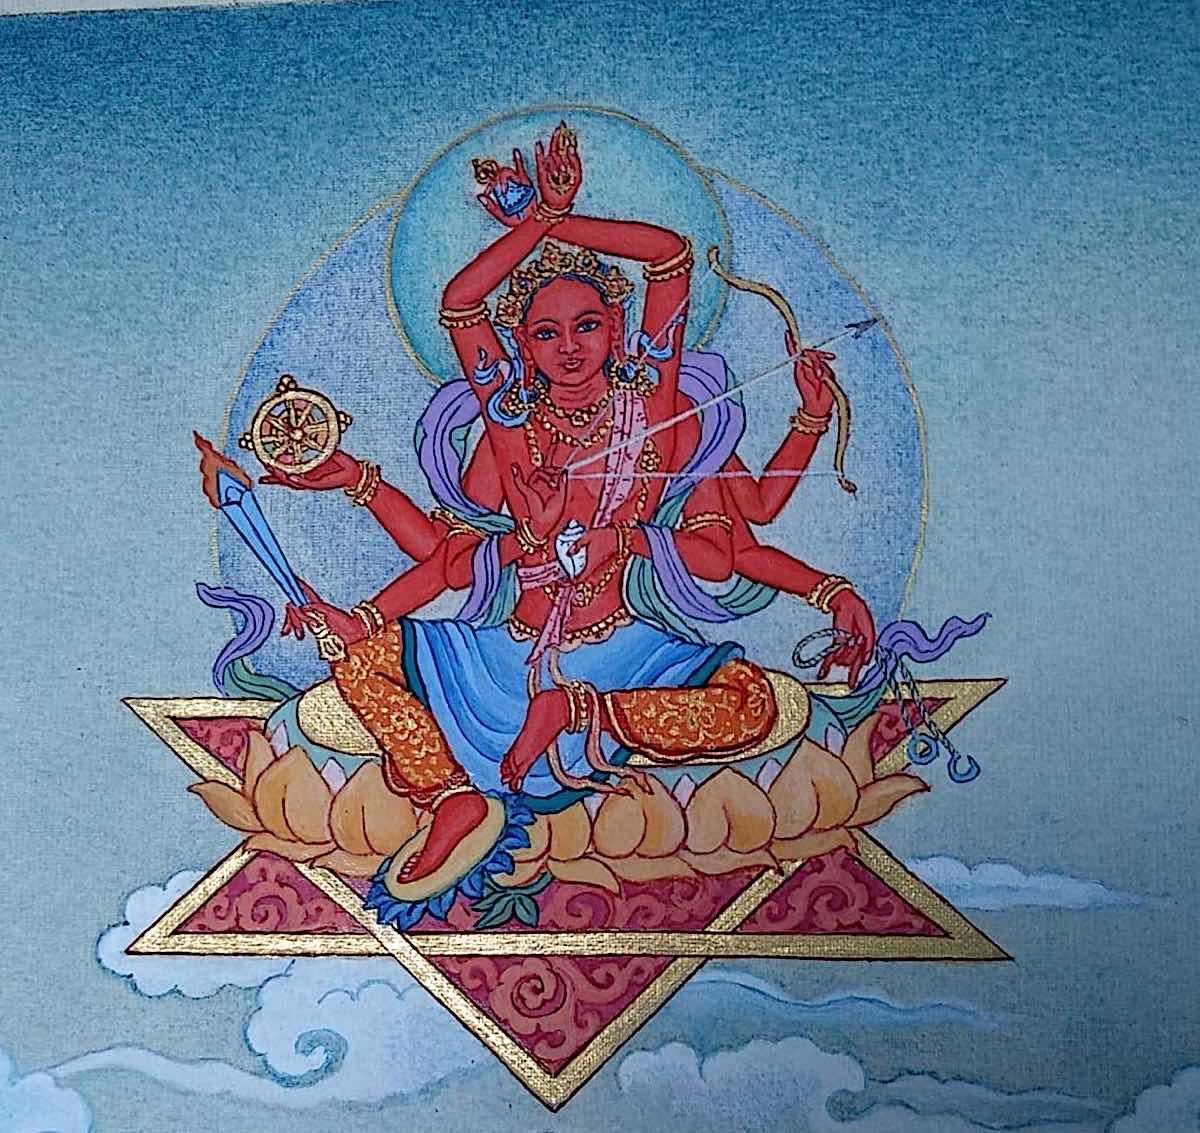 Buddha Weekly 1 Tara Swift and Heroid Pravira Tara 21 Taras Thankha by Angeli Lhadripa Shkonda Buddhism